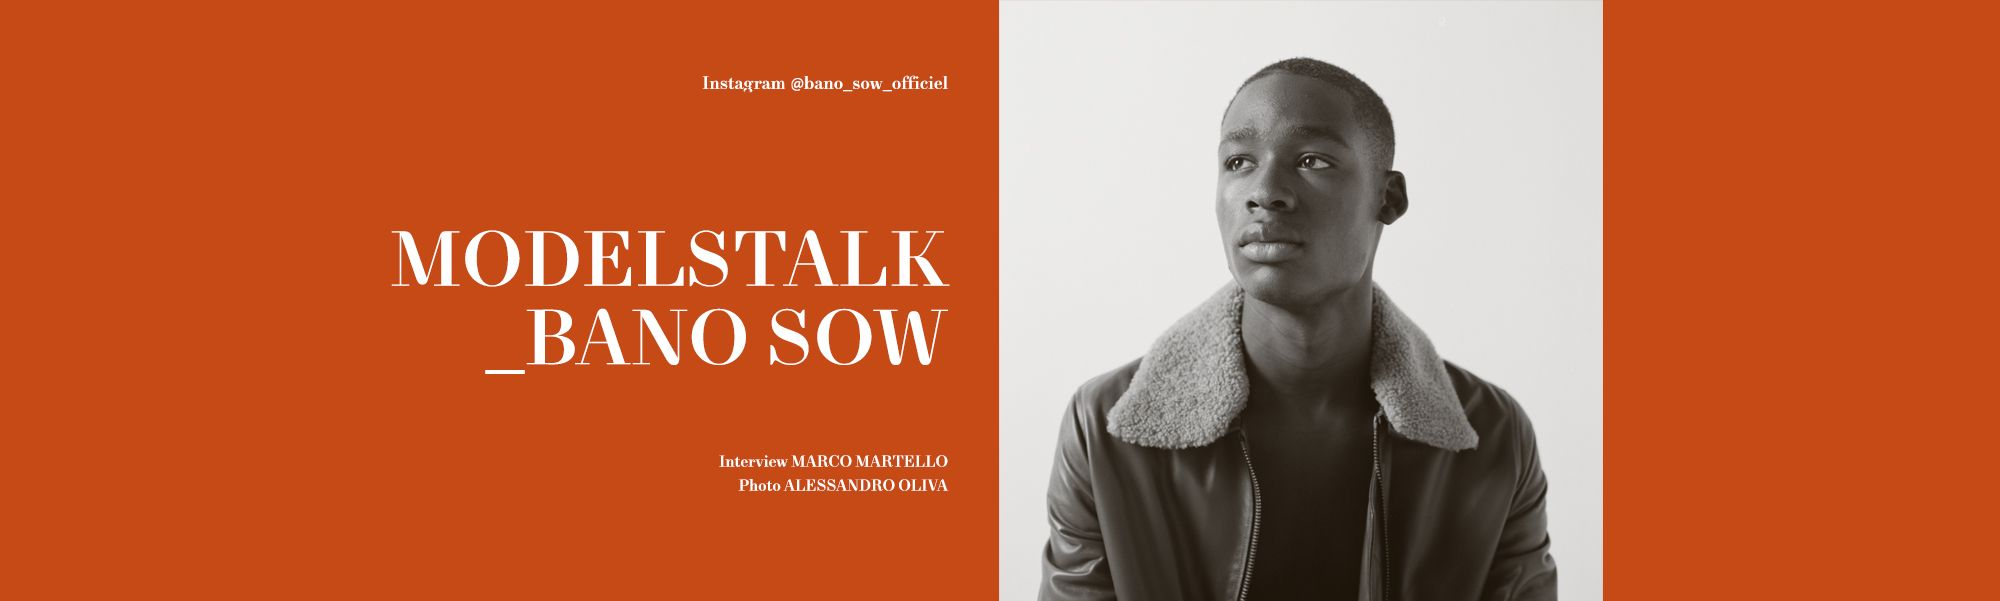 bano-sow-talking-heads-thegreatestmagazine-main-banner